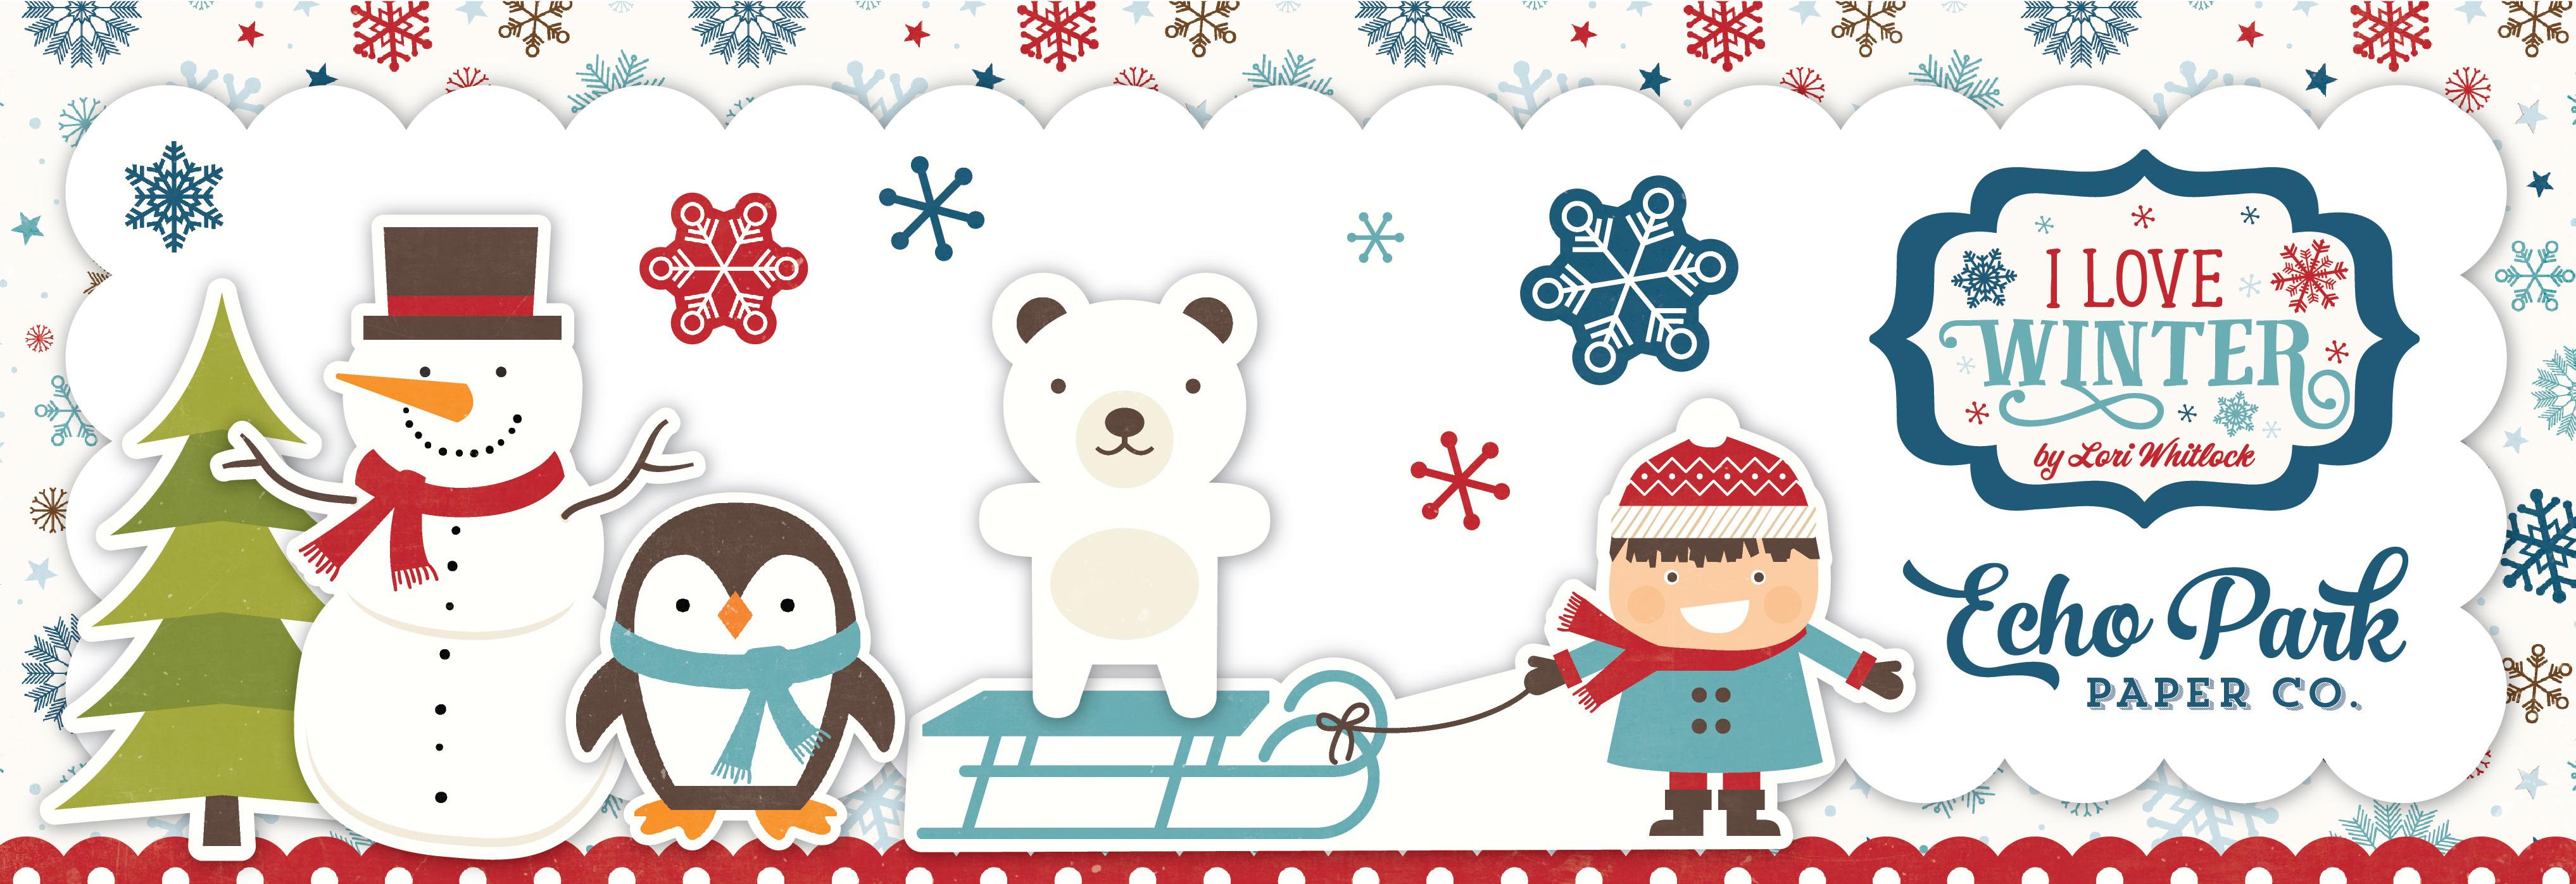 -snapclick-winter16-ep-banner.jpg